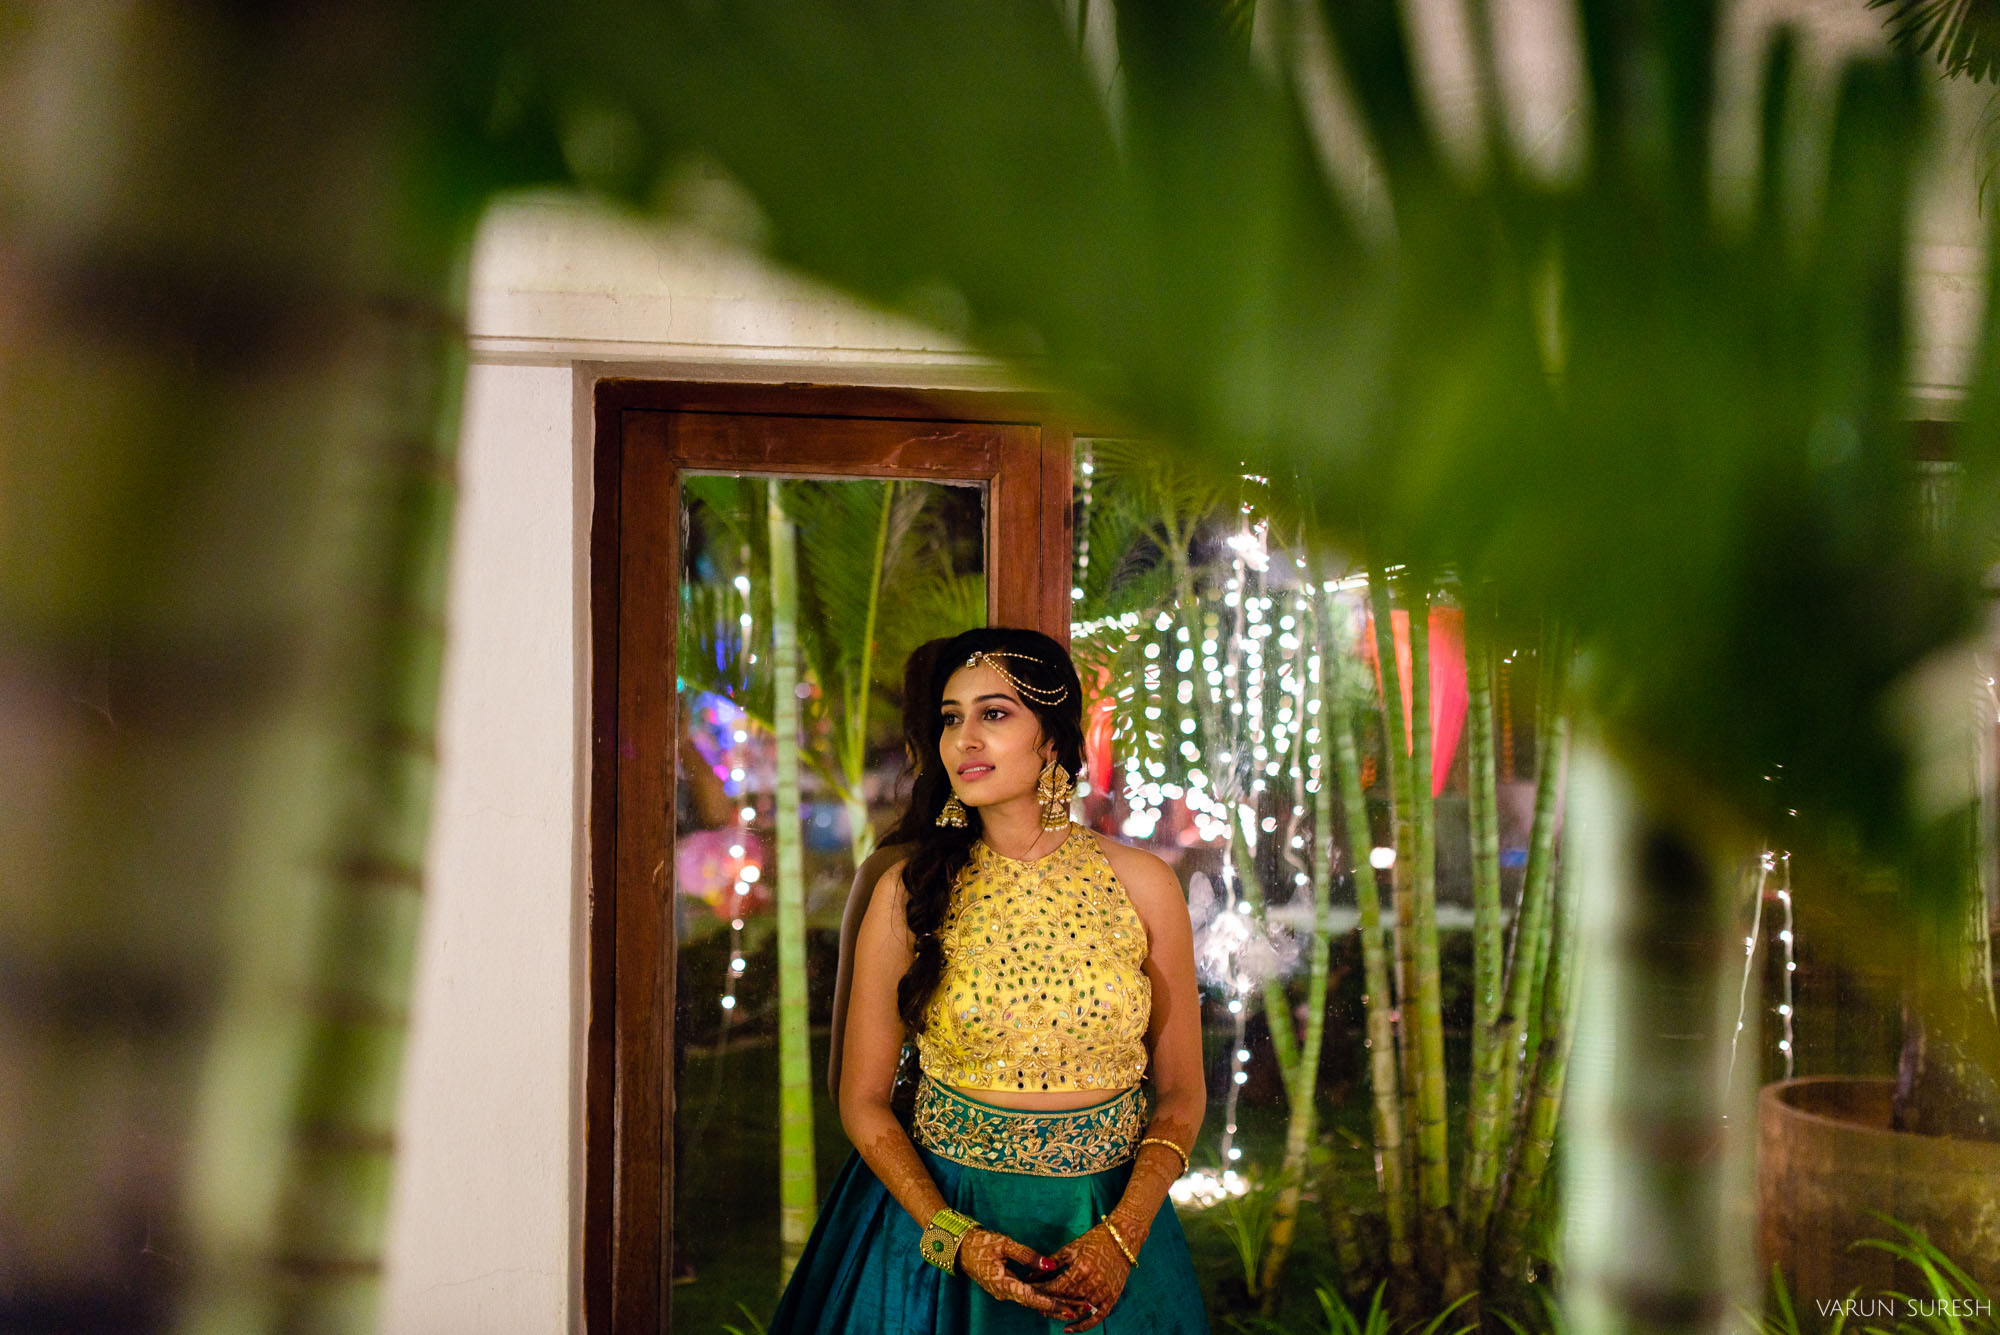 Anjanah_Aditya_1-4.jpg